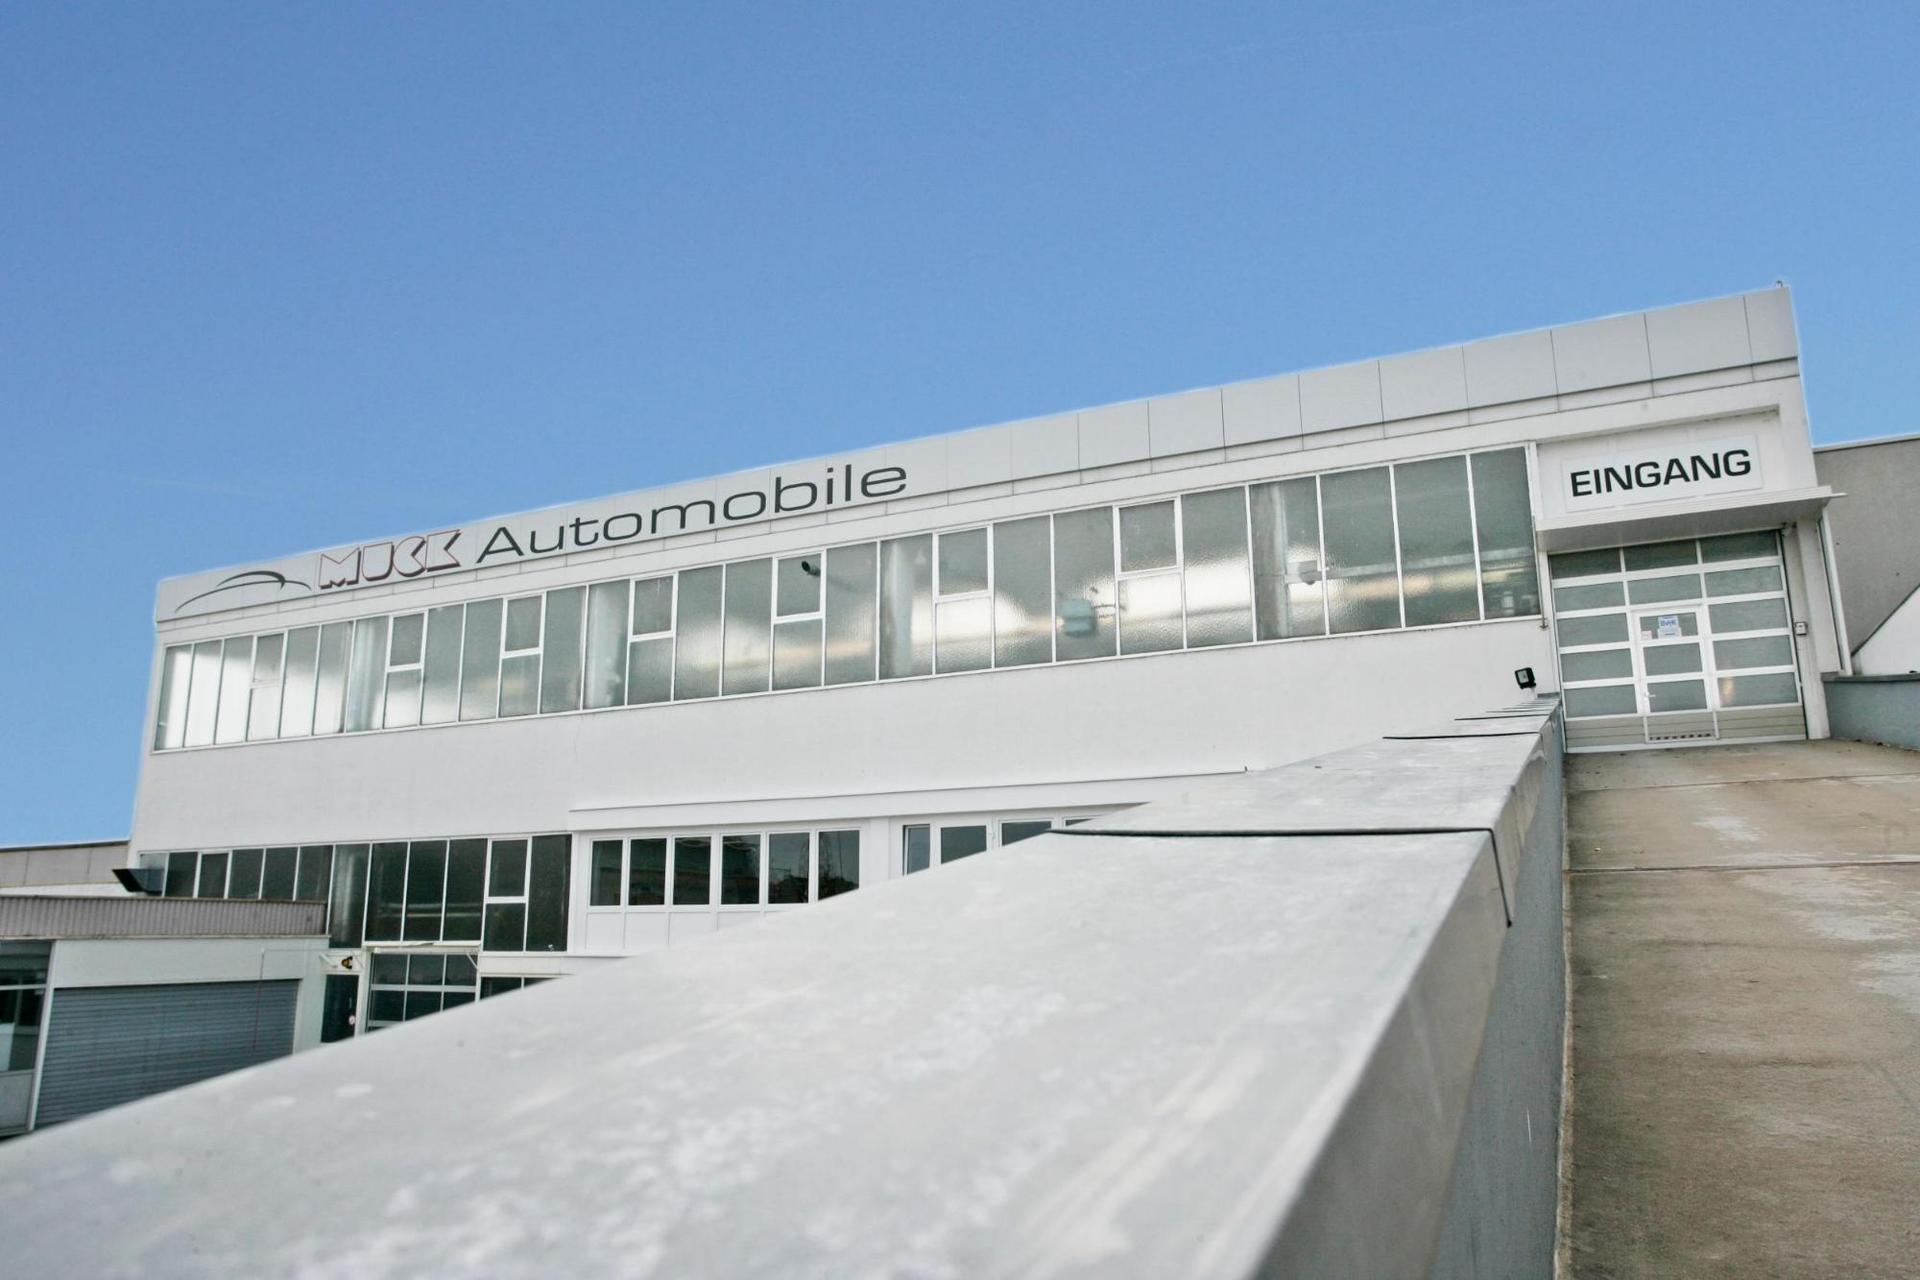 Muck Automobile GmbH